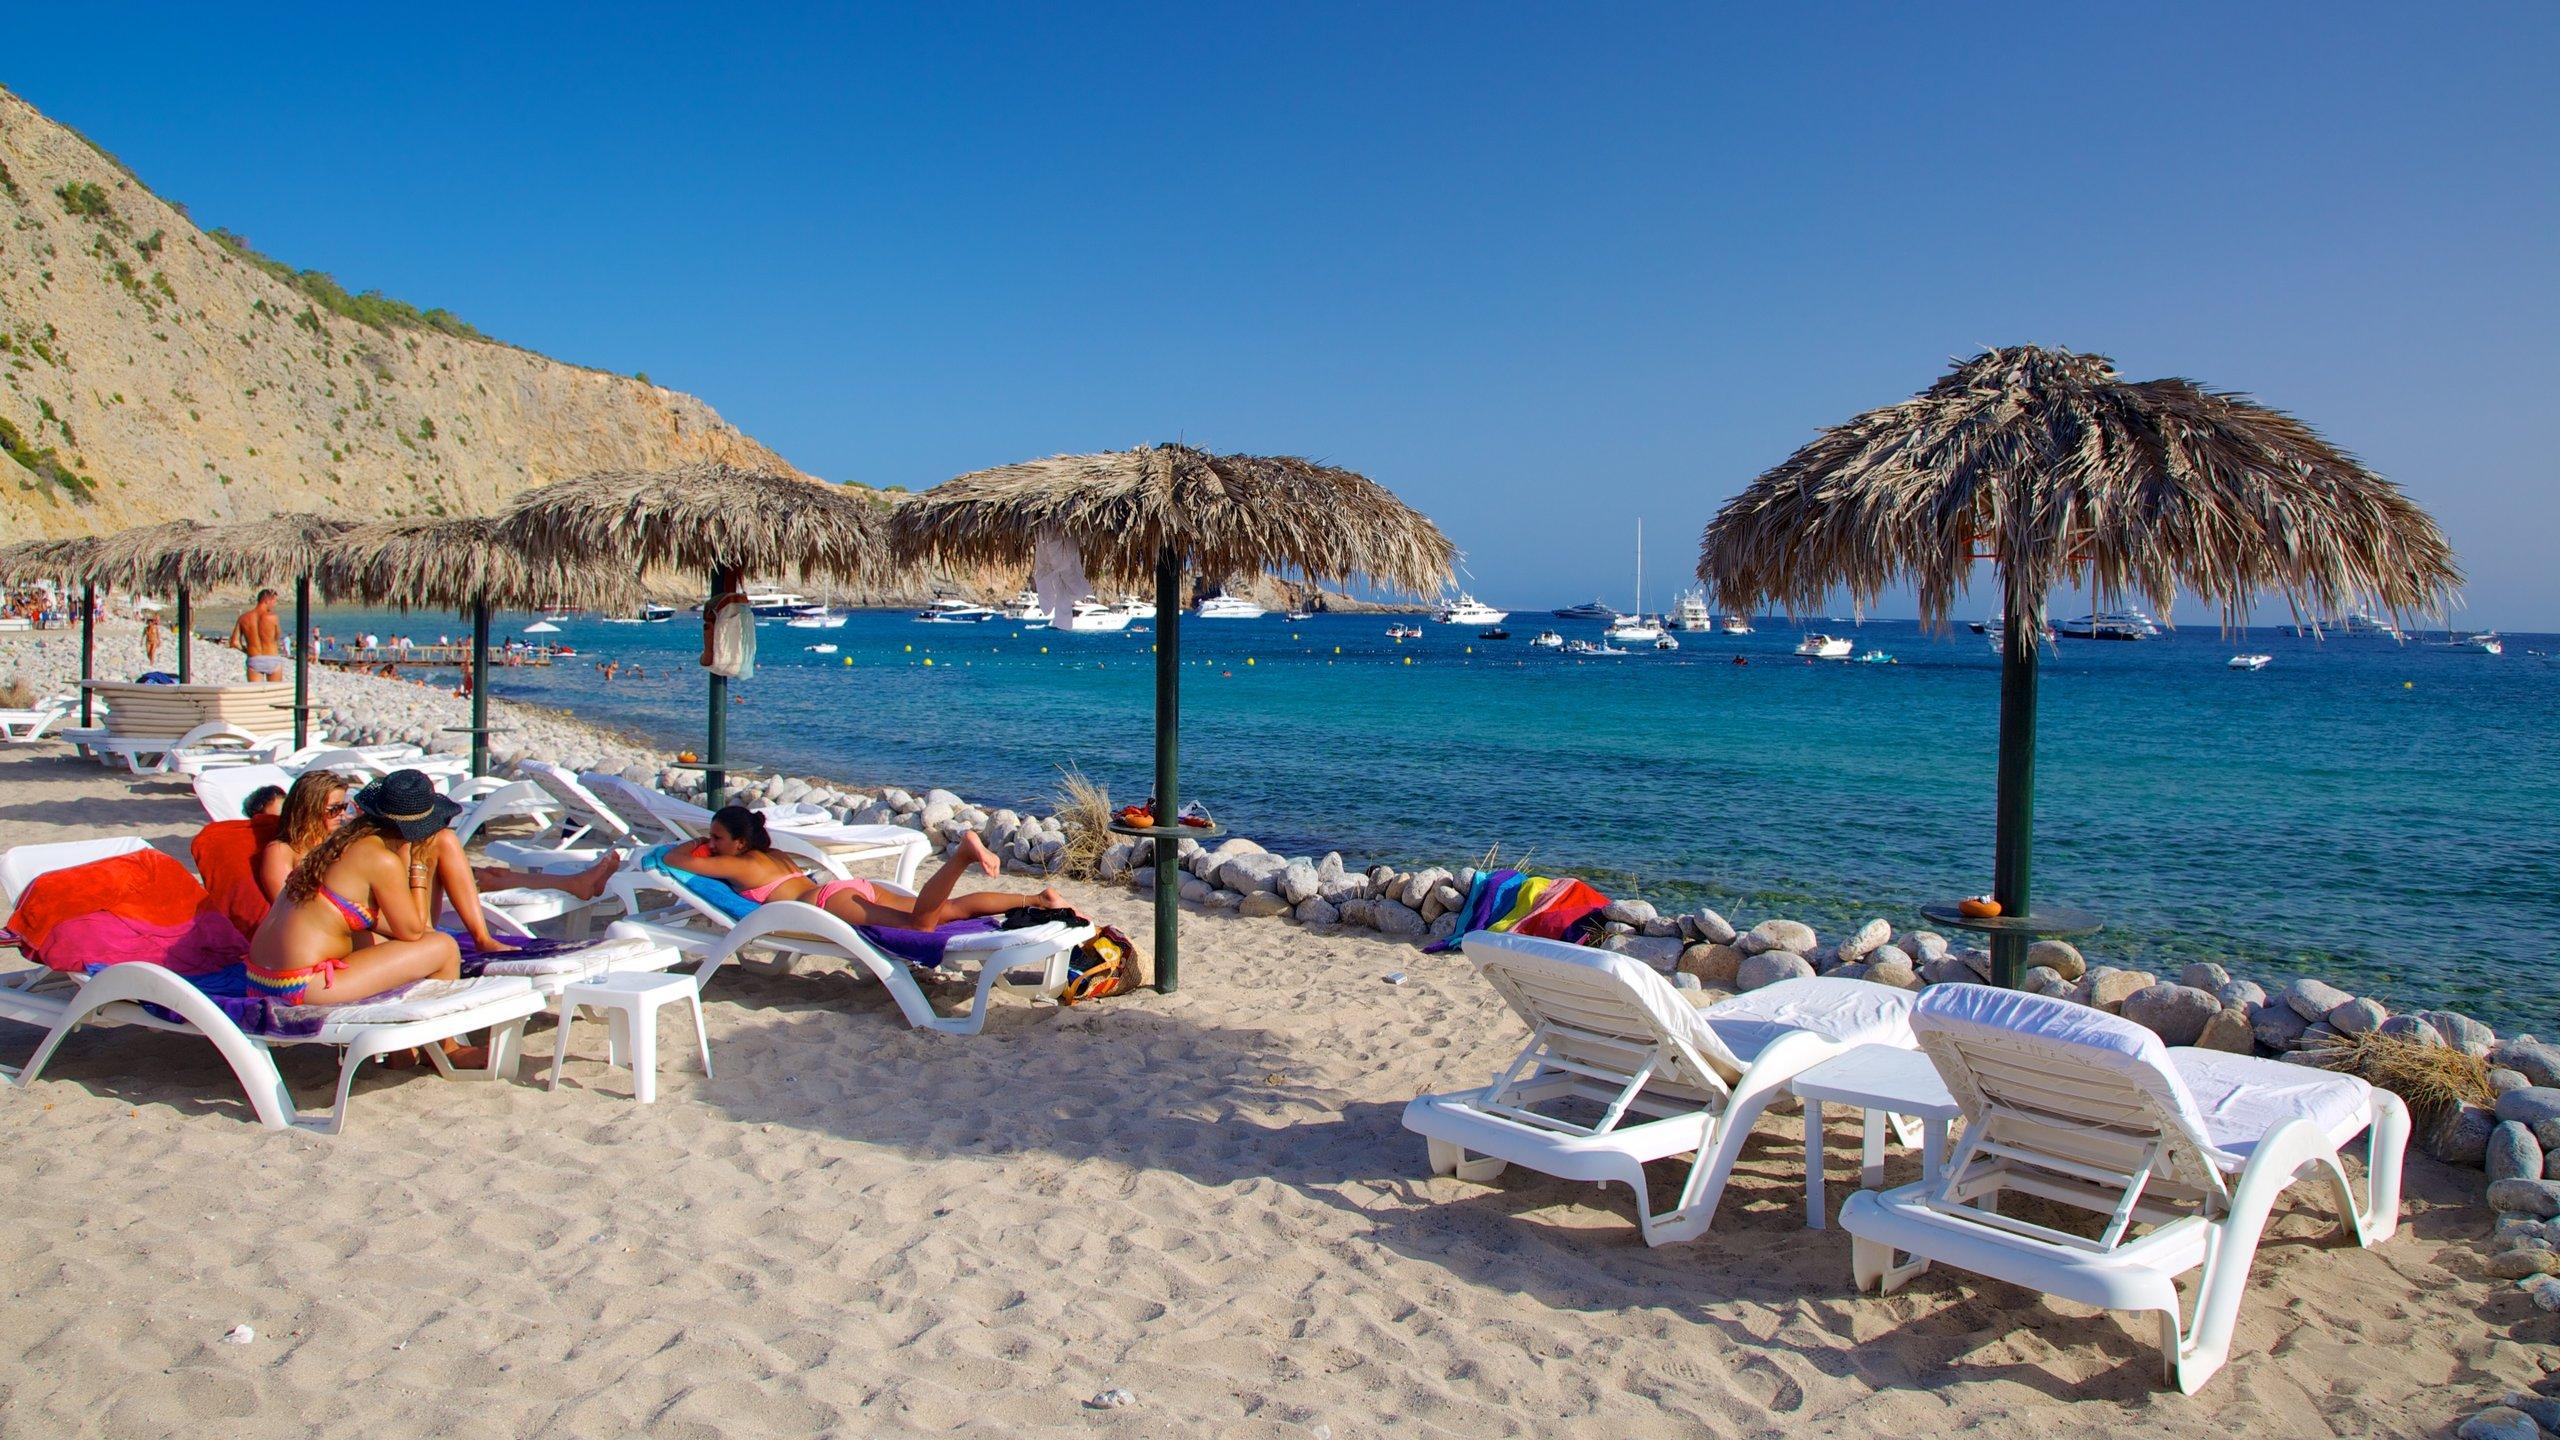 Cala Jondal Beach, Sant Josep de sa Talaia, Balearic Islands, Spain